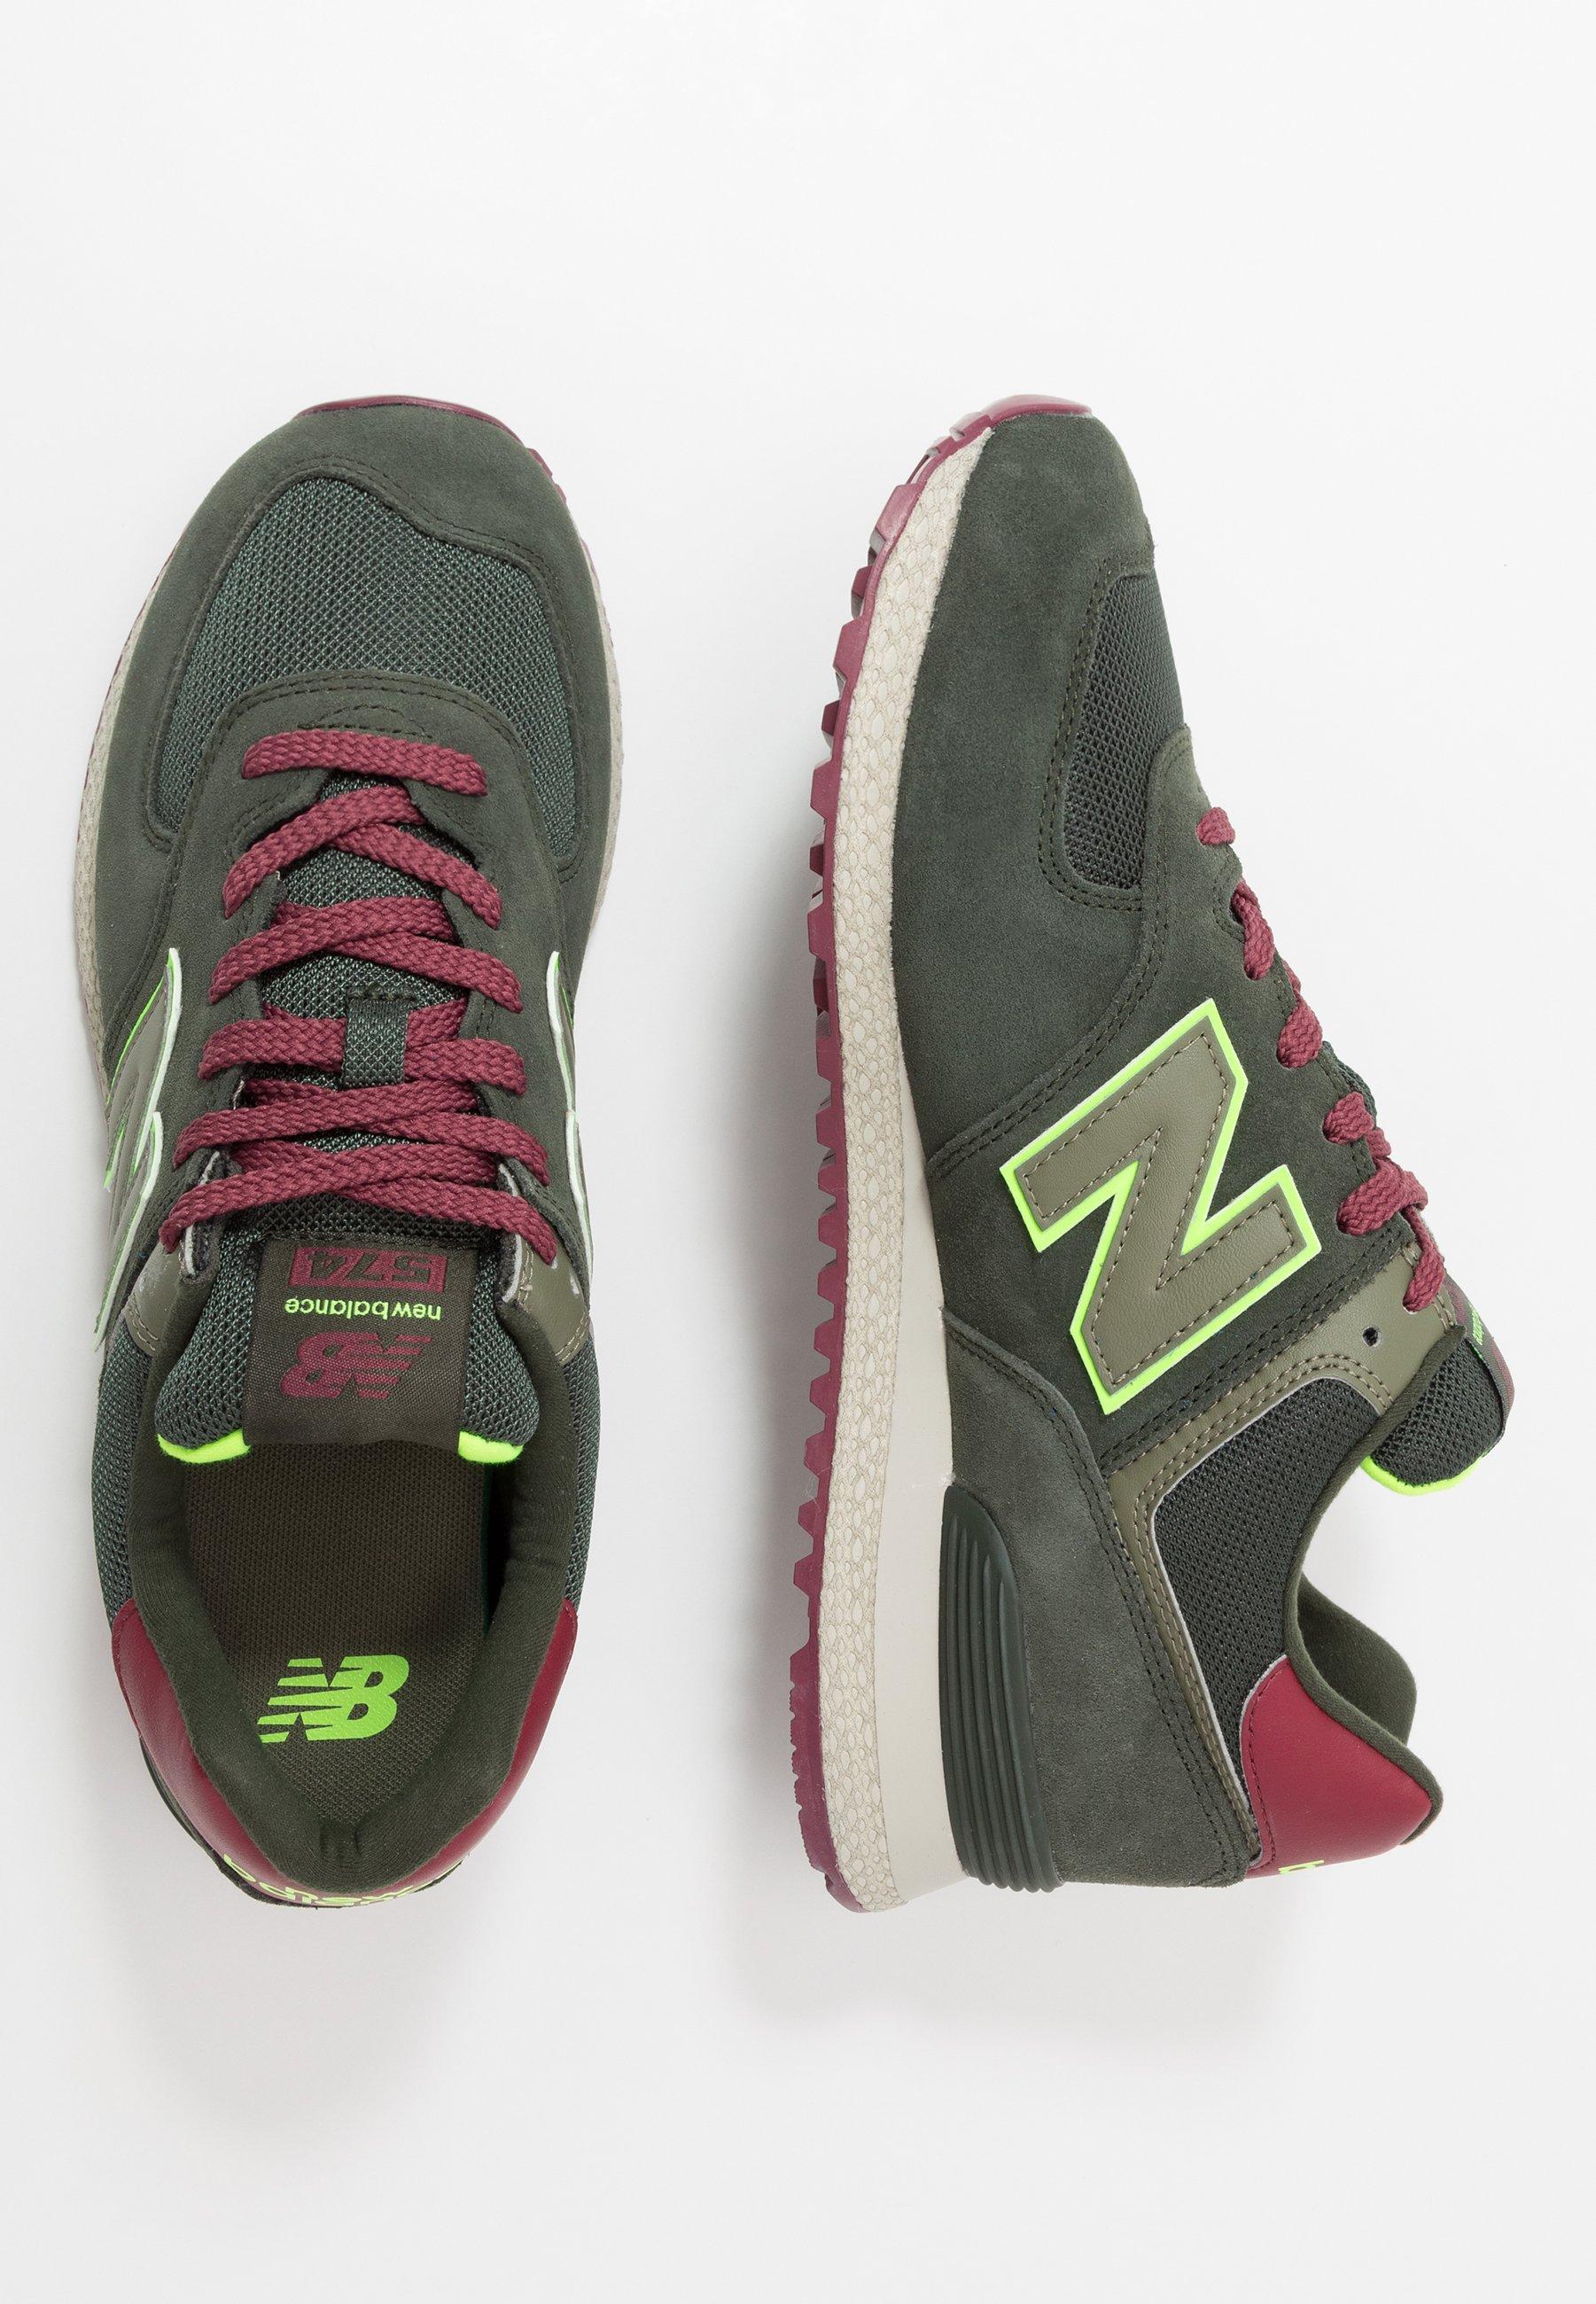 New Balance 574 - Sneakers basse - green/verde scuro - Zalando.it